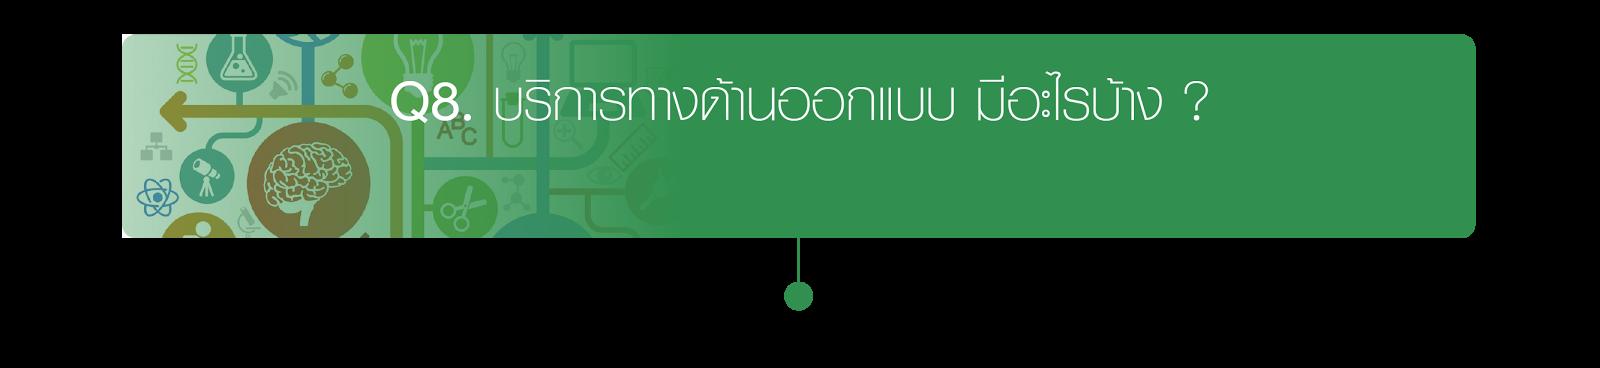 FAQ_img_08_บริการด้านงานออกแบบครบวงจร